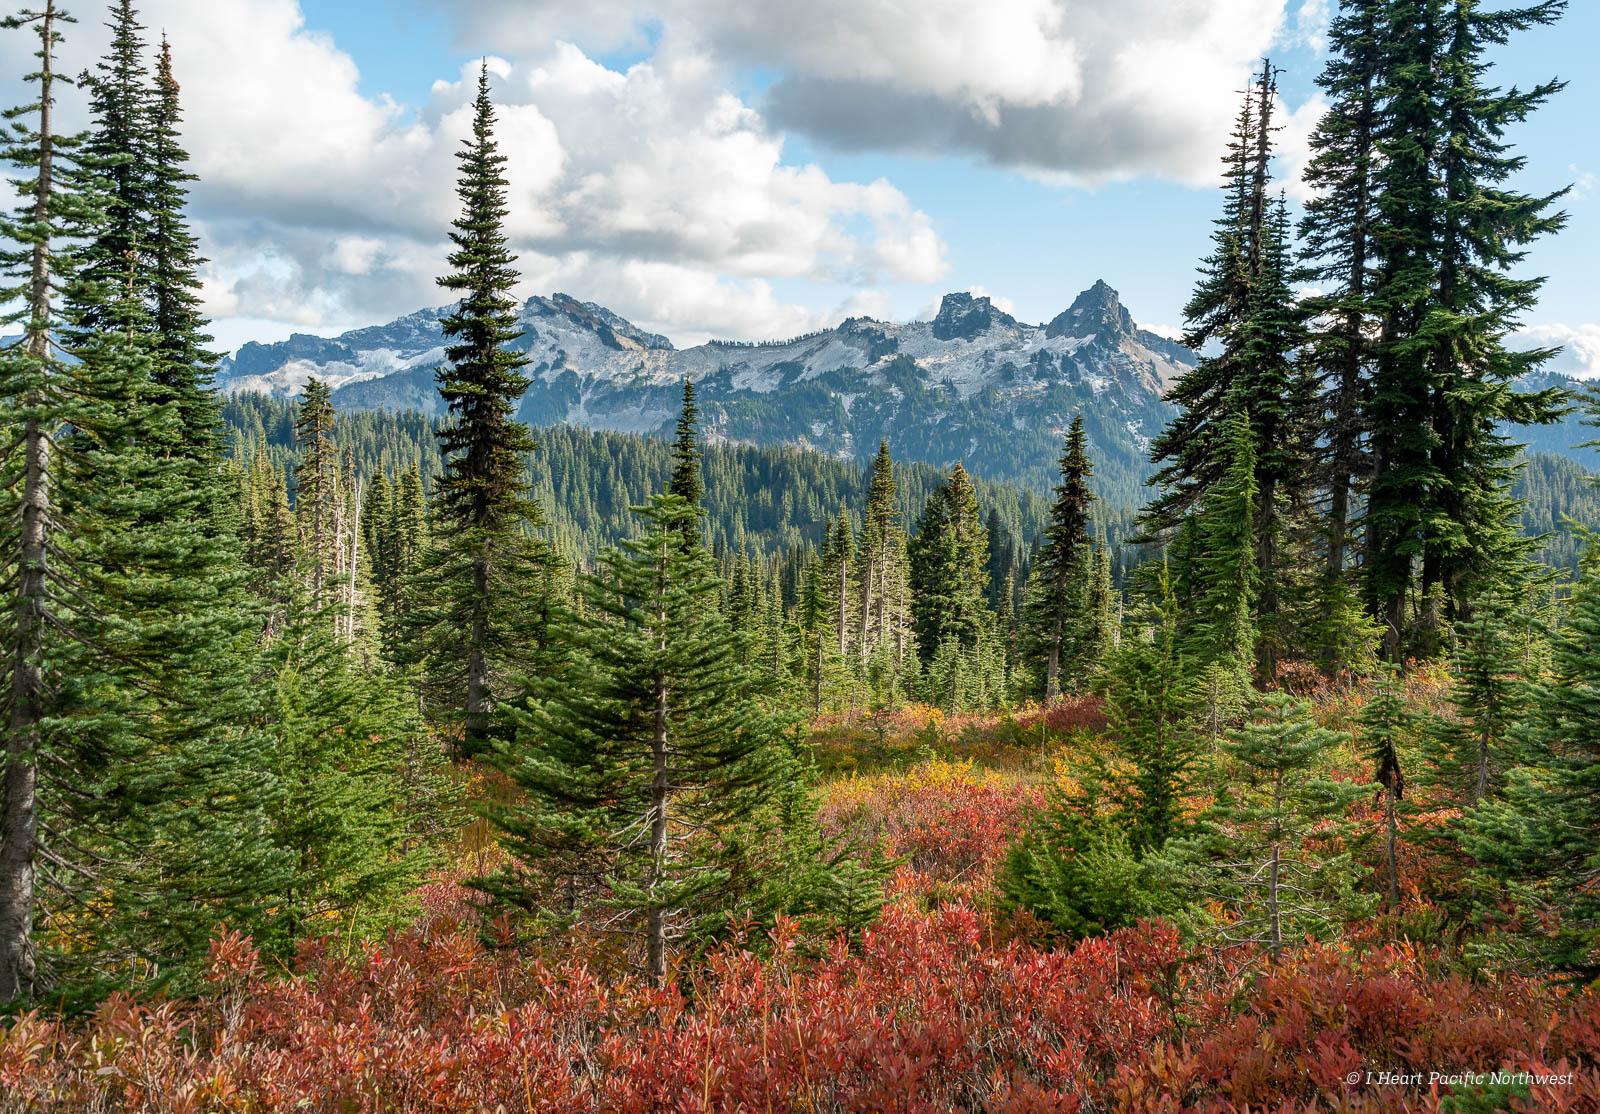 Mount Rainier National Park - Paradise in the fall